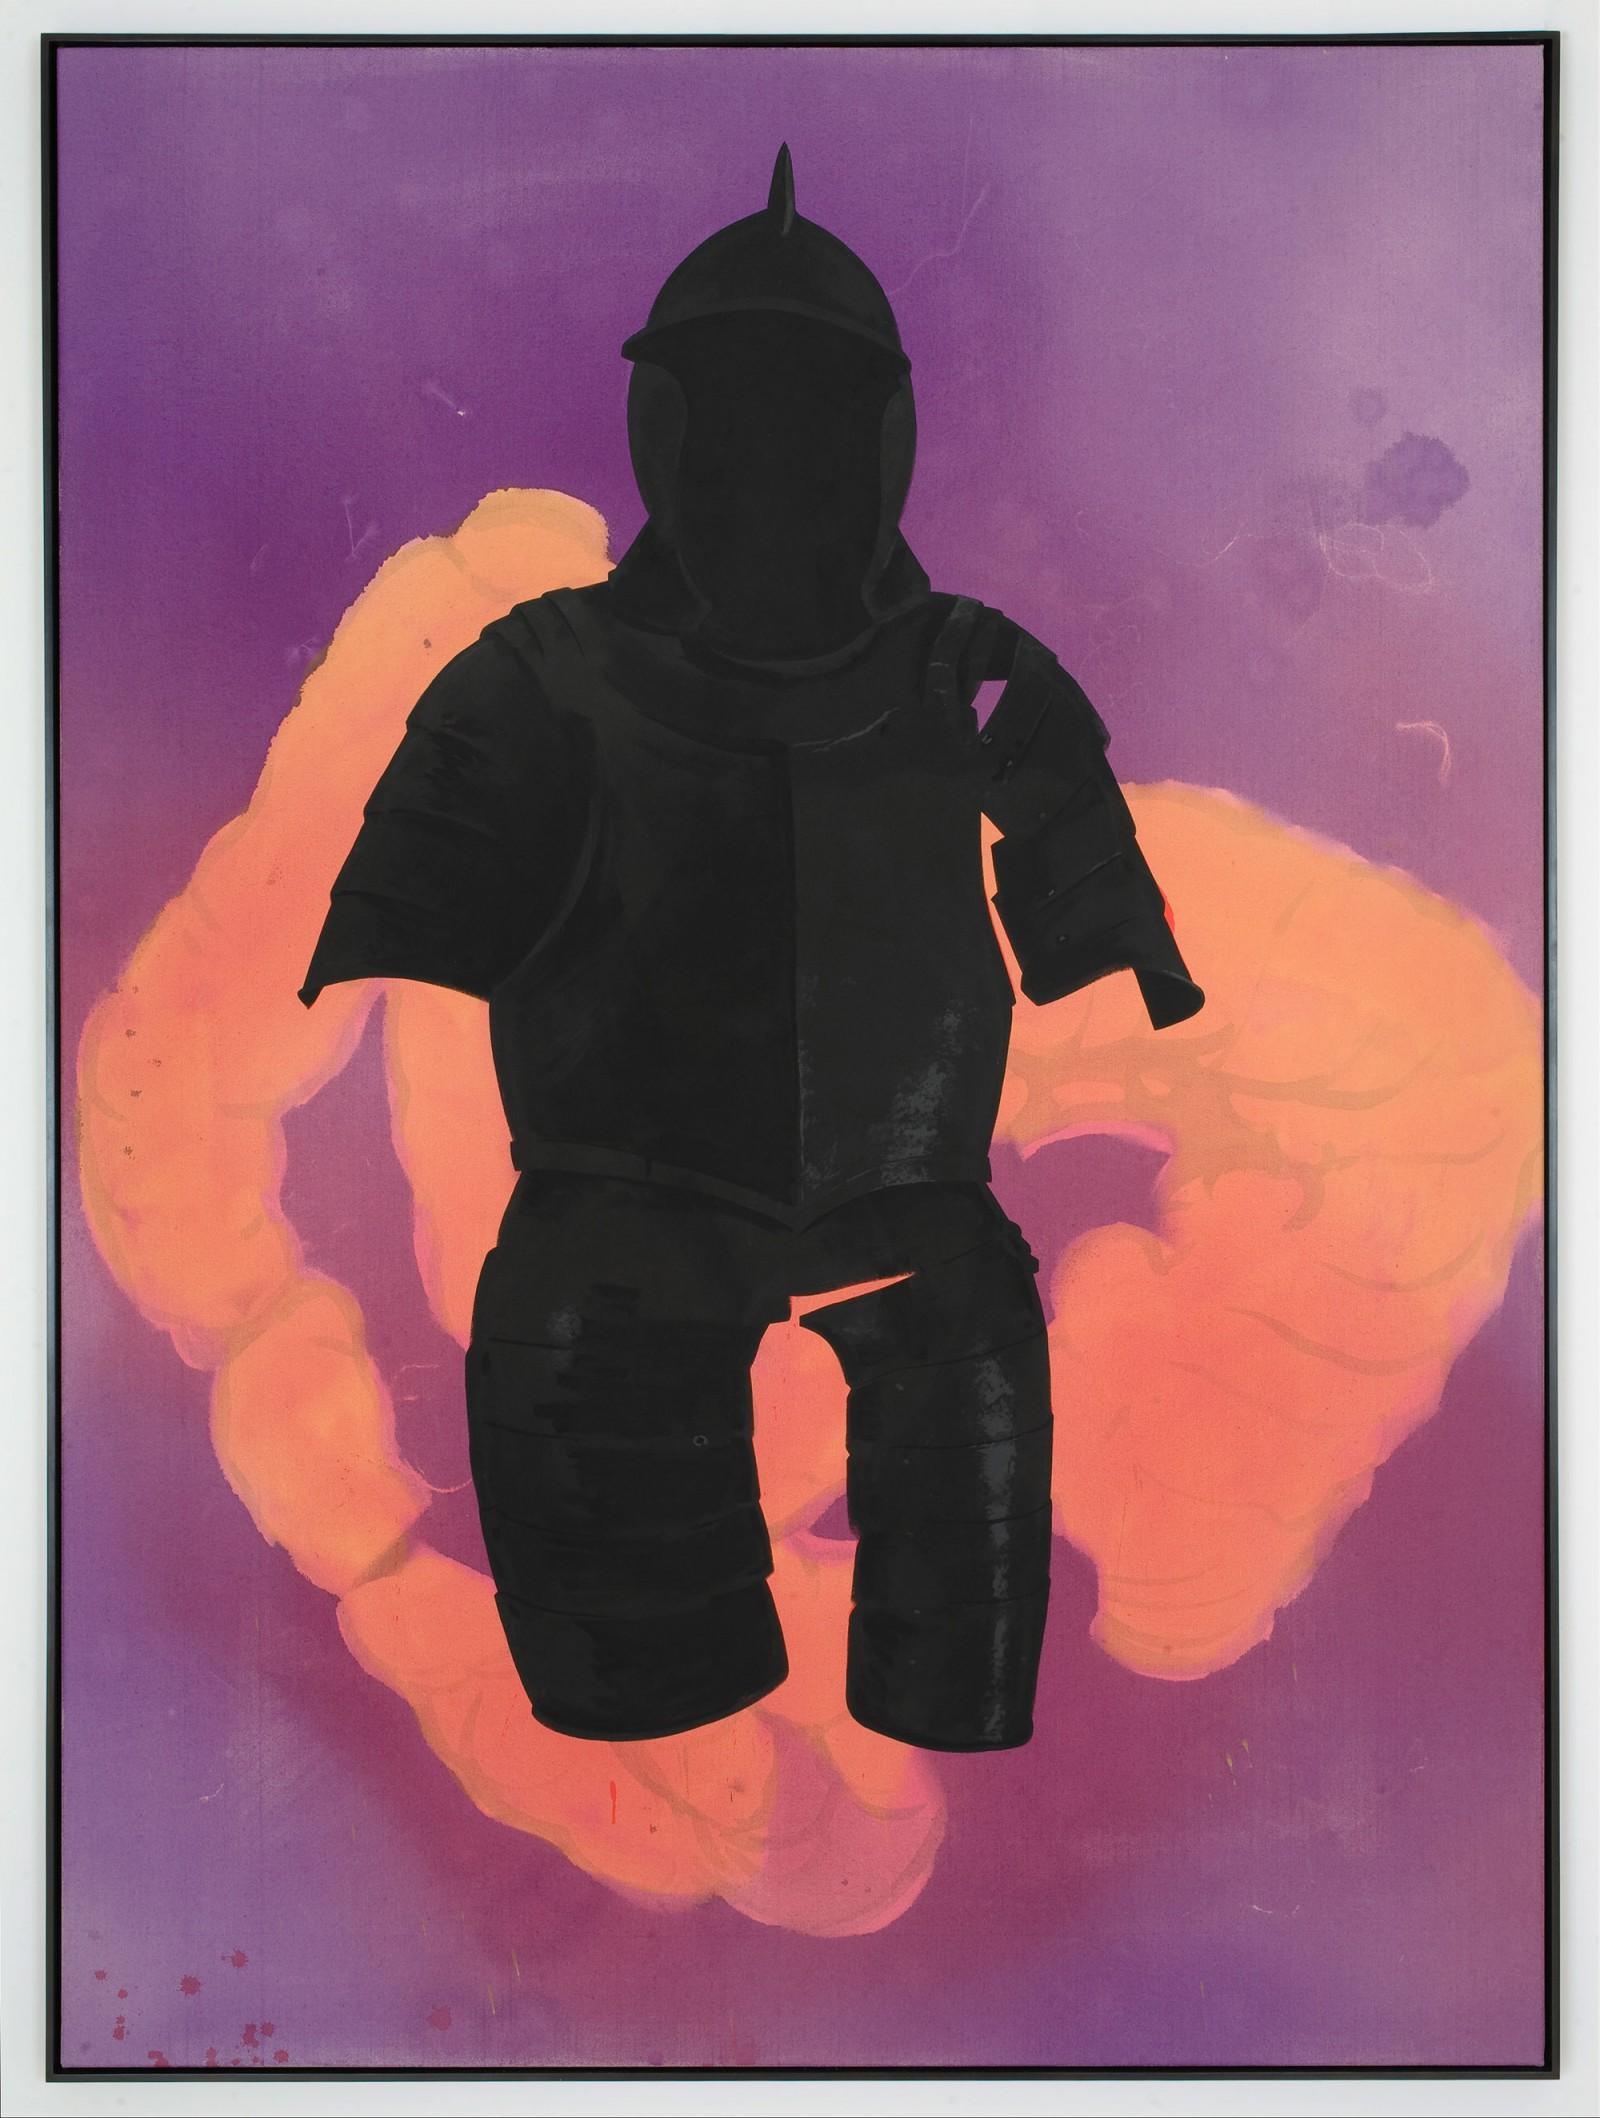 Kim Nekarda: untitled, 2008, vinyl color on cotton, framed, 190 x 140 cm, private collection, Hamburg